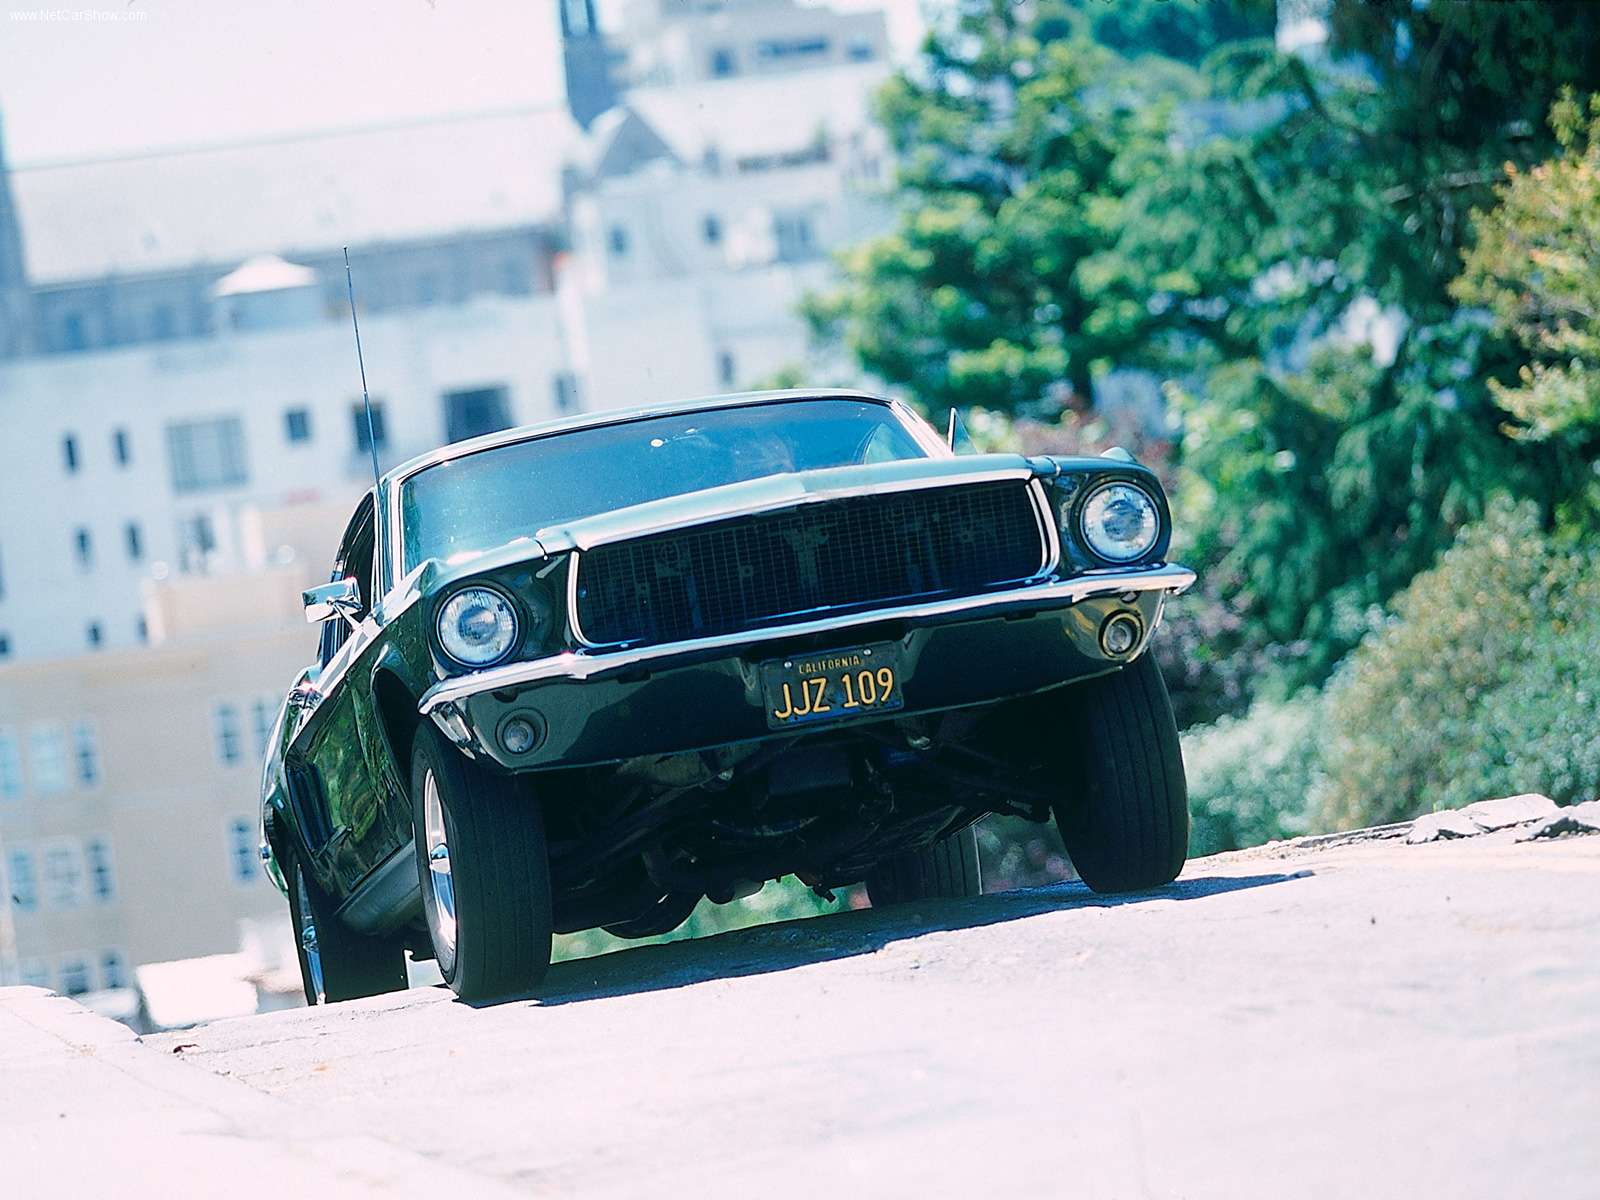 http://1.bp.blogspot.com/_4-yBZr5goc4/TRZ80YjevgI/AAAAAAAAAyw/ALaivCymtY0/s1600/1968_Mustang_Bullitt_Fastback.jpg